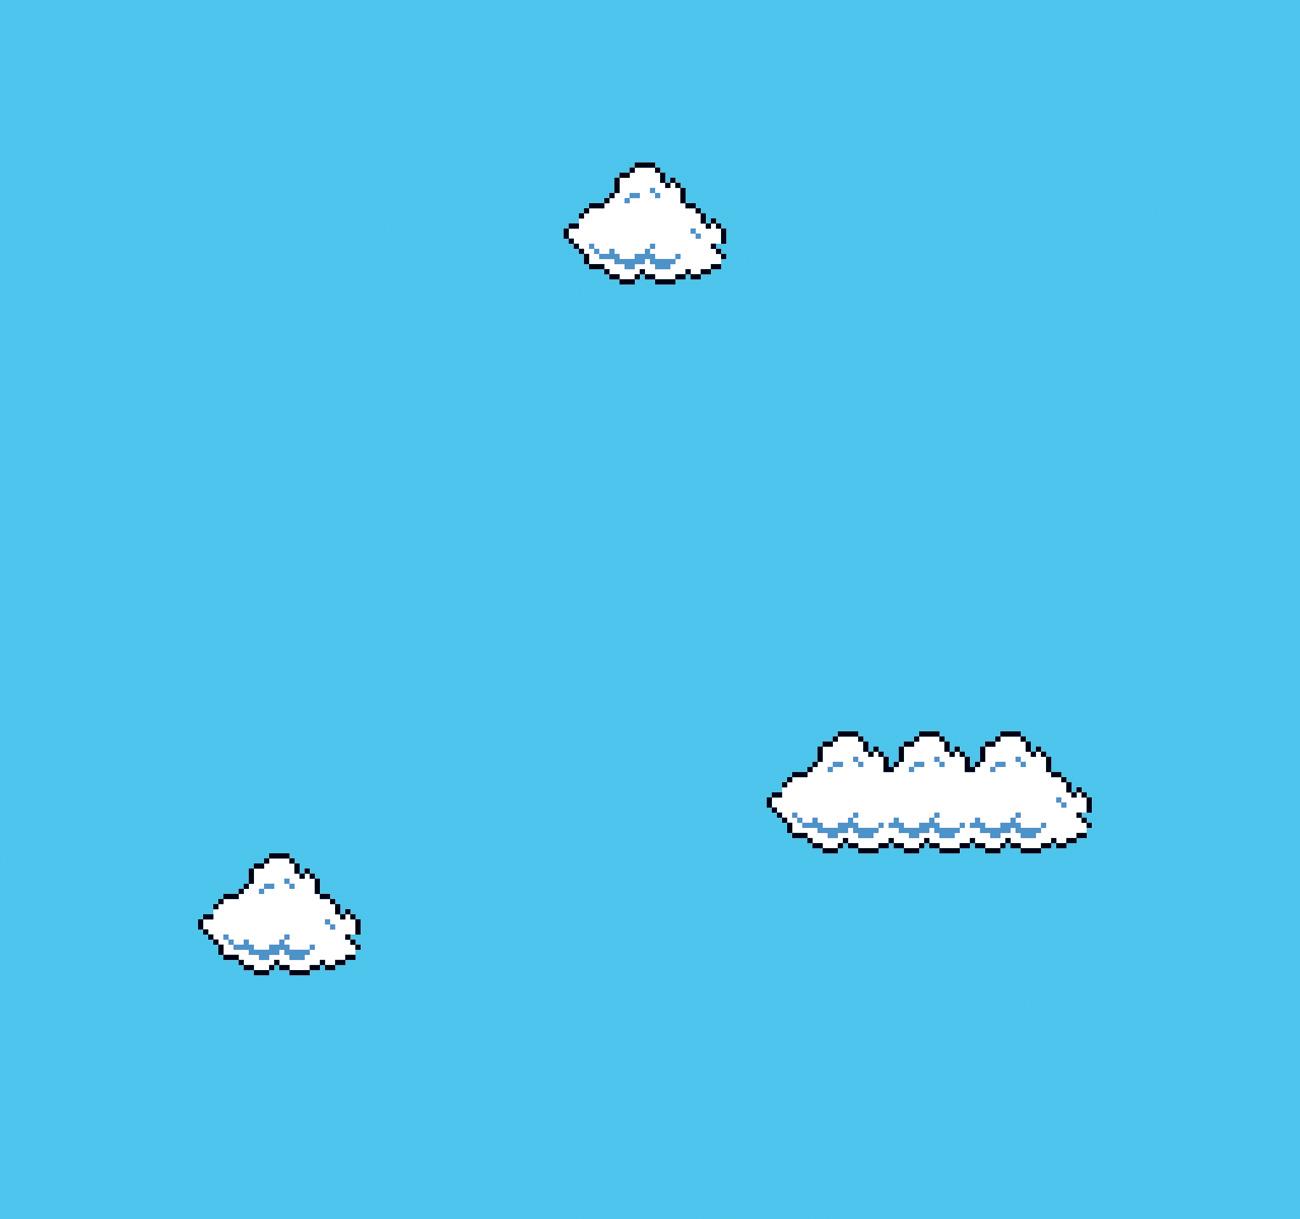 Cory Archangel, Super Mario Clouds, 2002